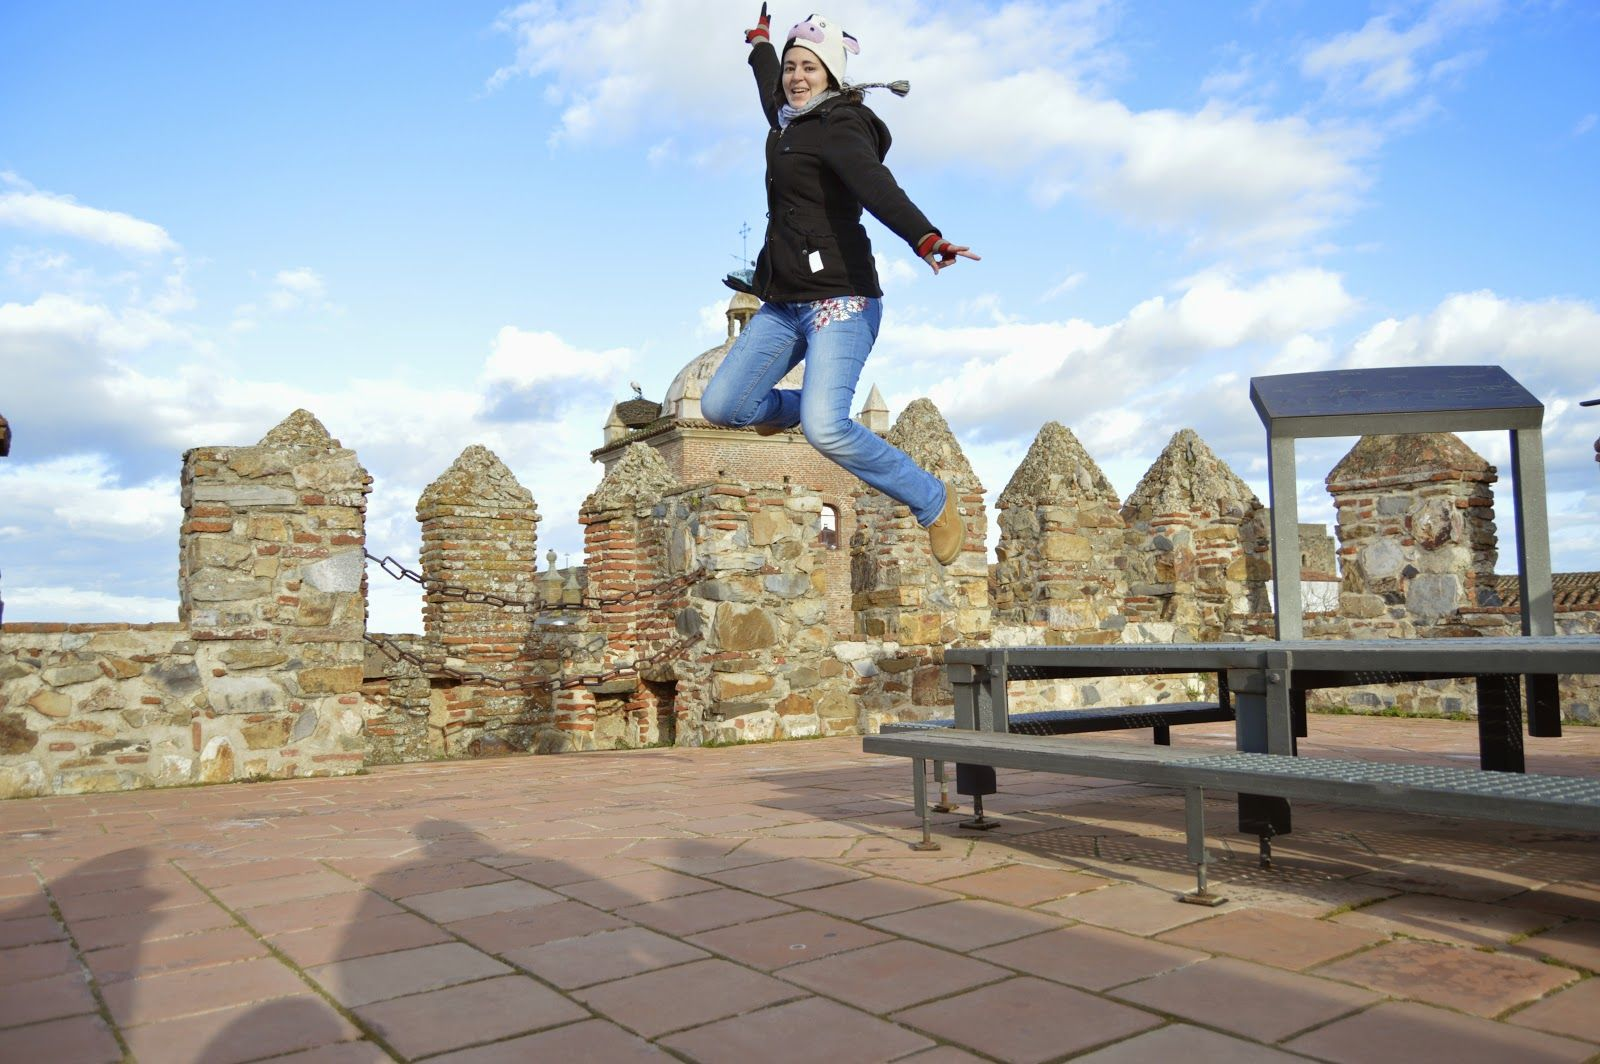 Mi Mundo en Fotografias:  Miercoles Mudo: Salta conmigo